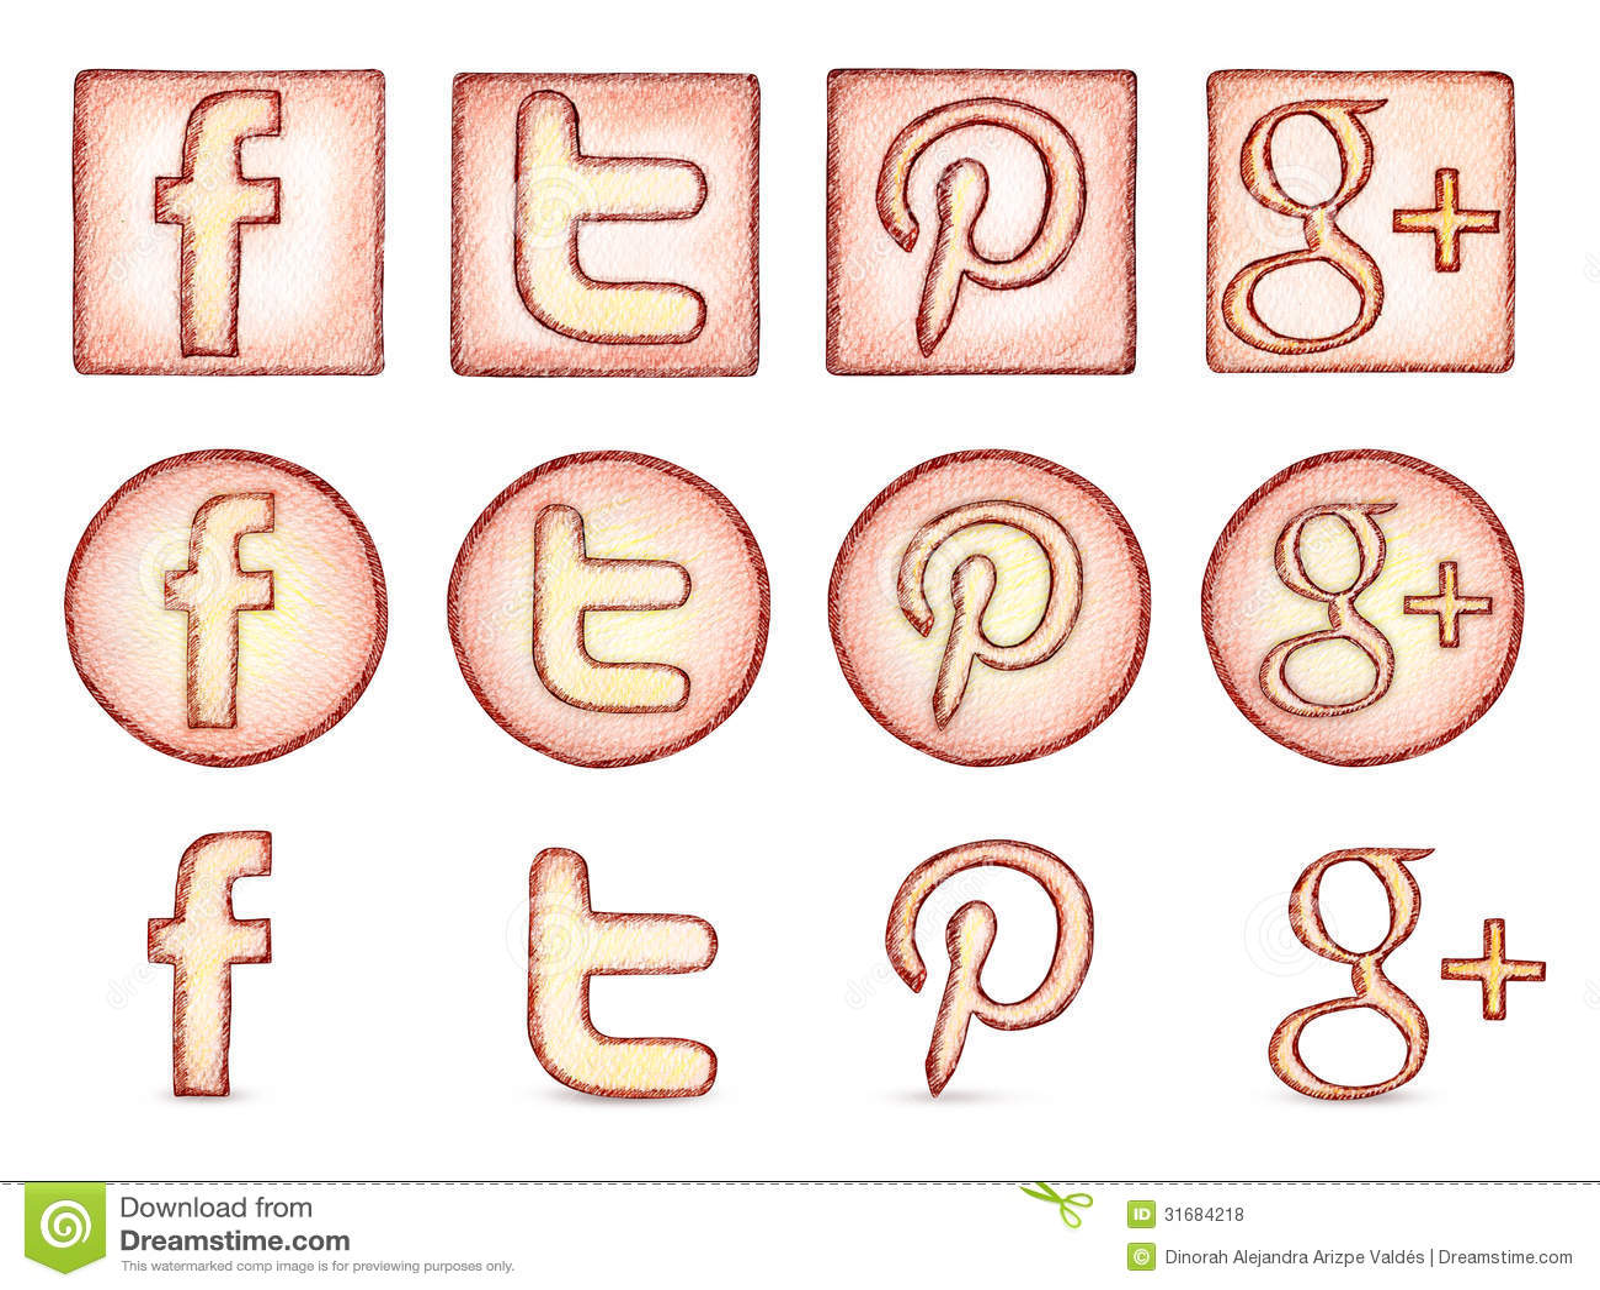 Popular social network icons